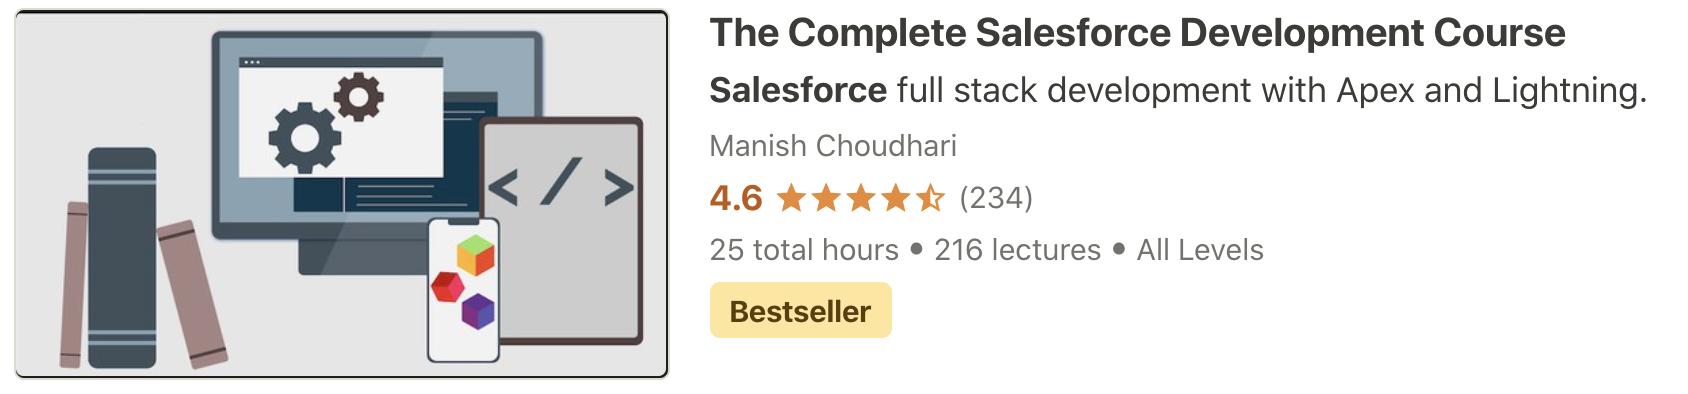 Salesforce Development Course